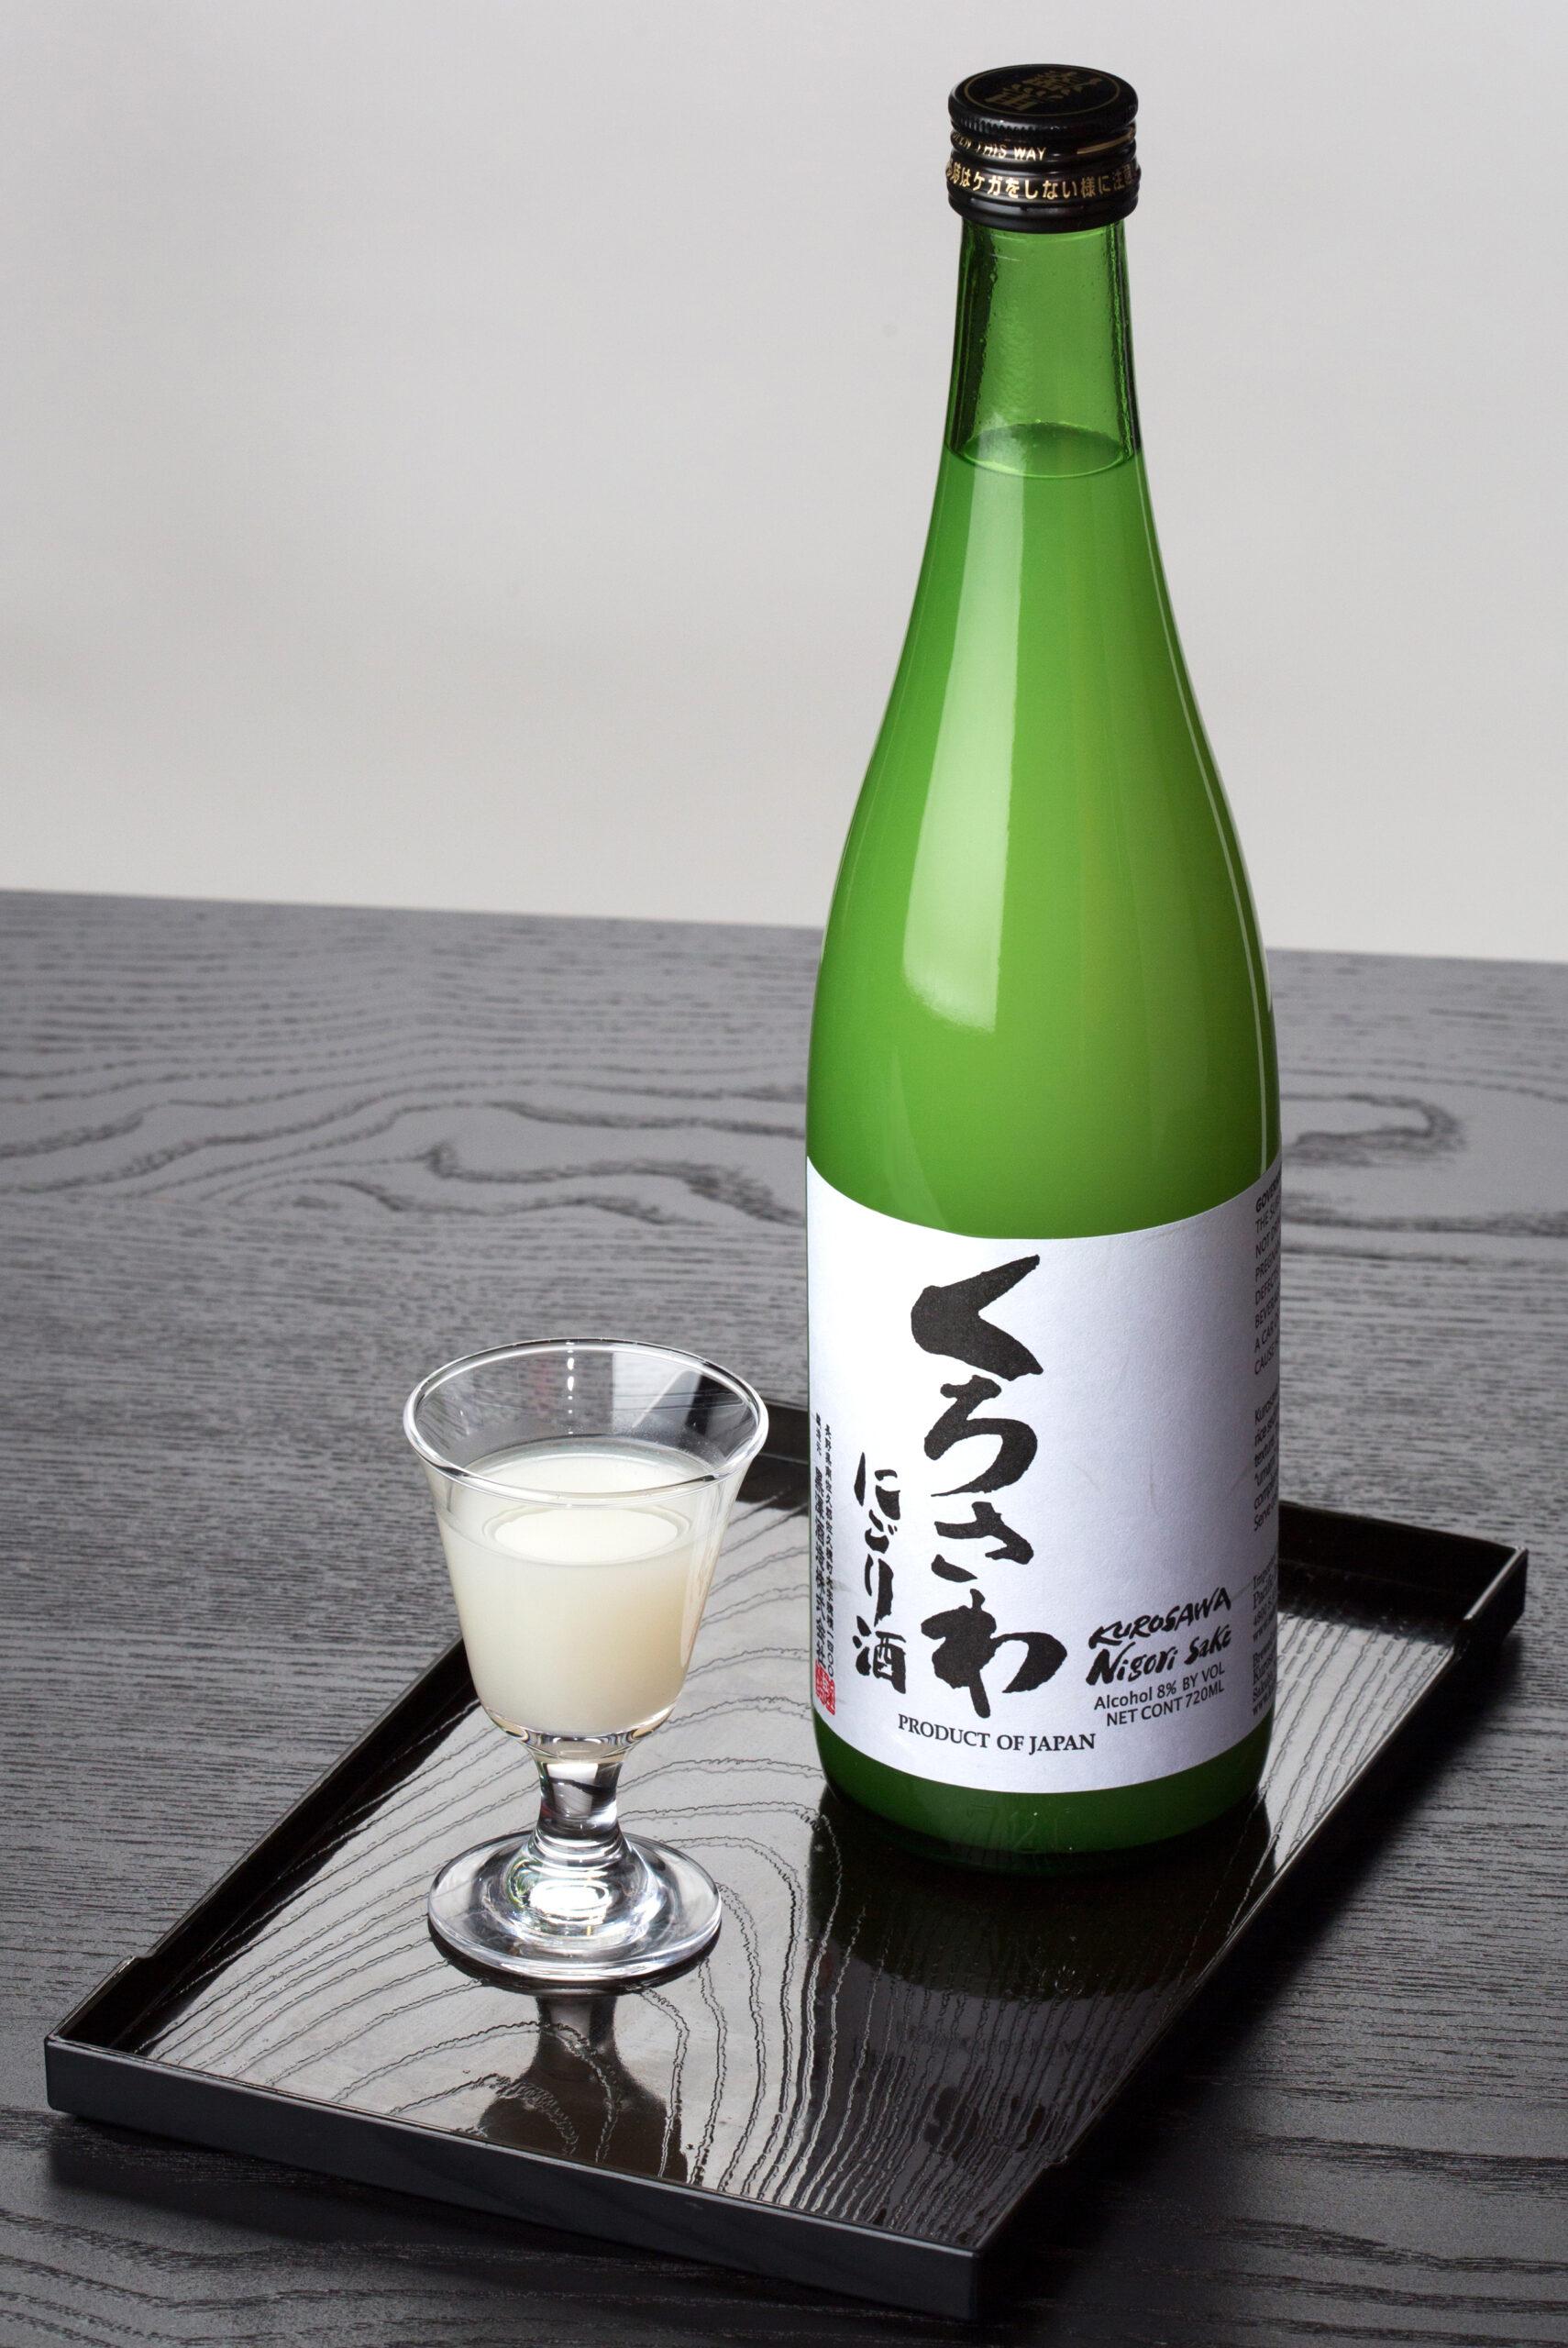 kurosawa_nigori_bottle